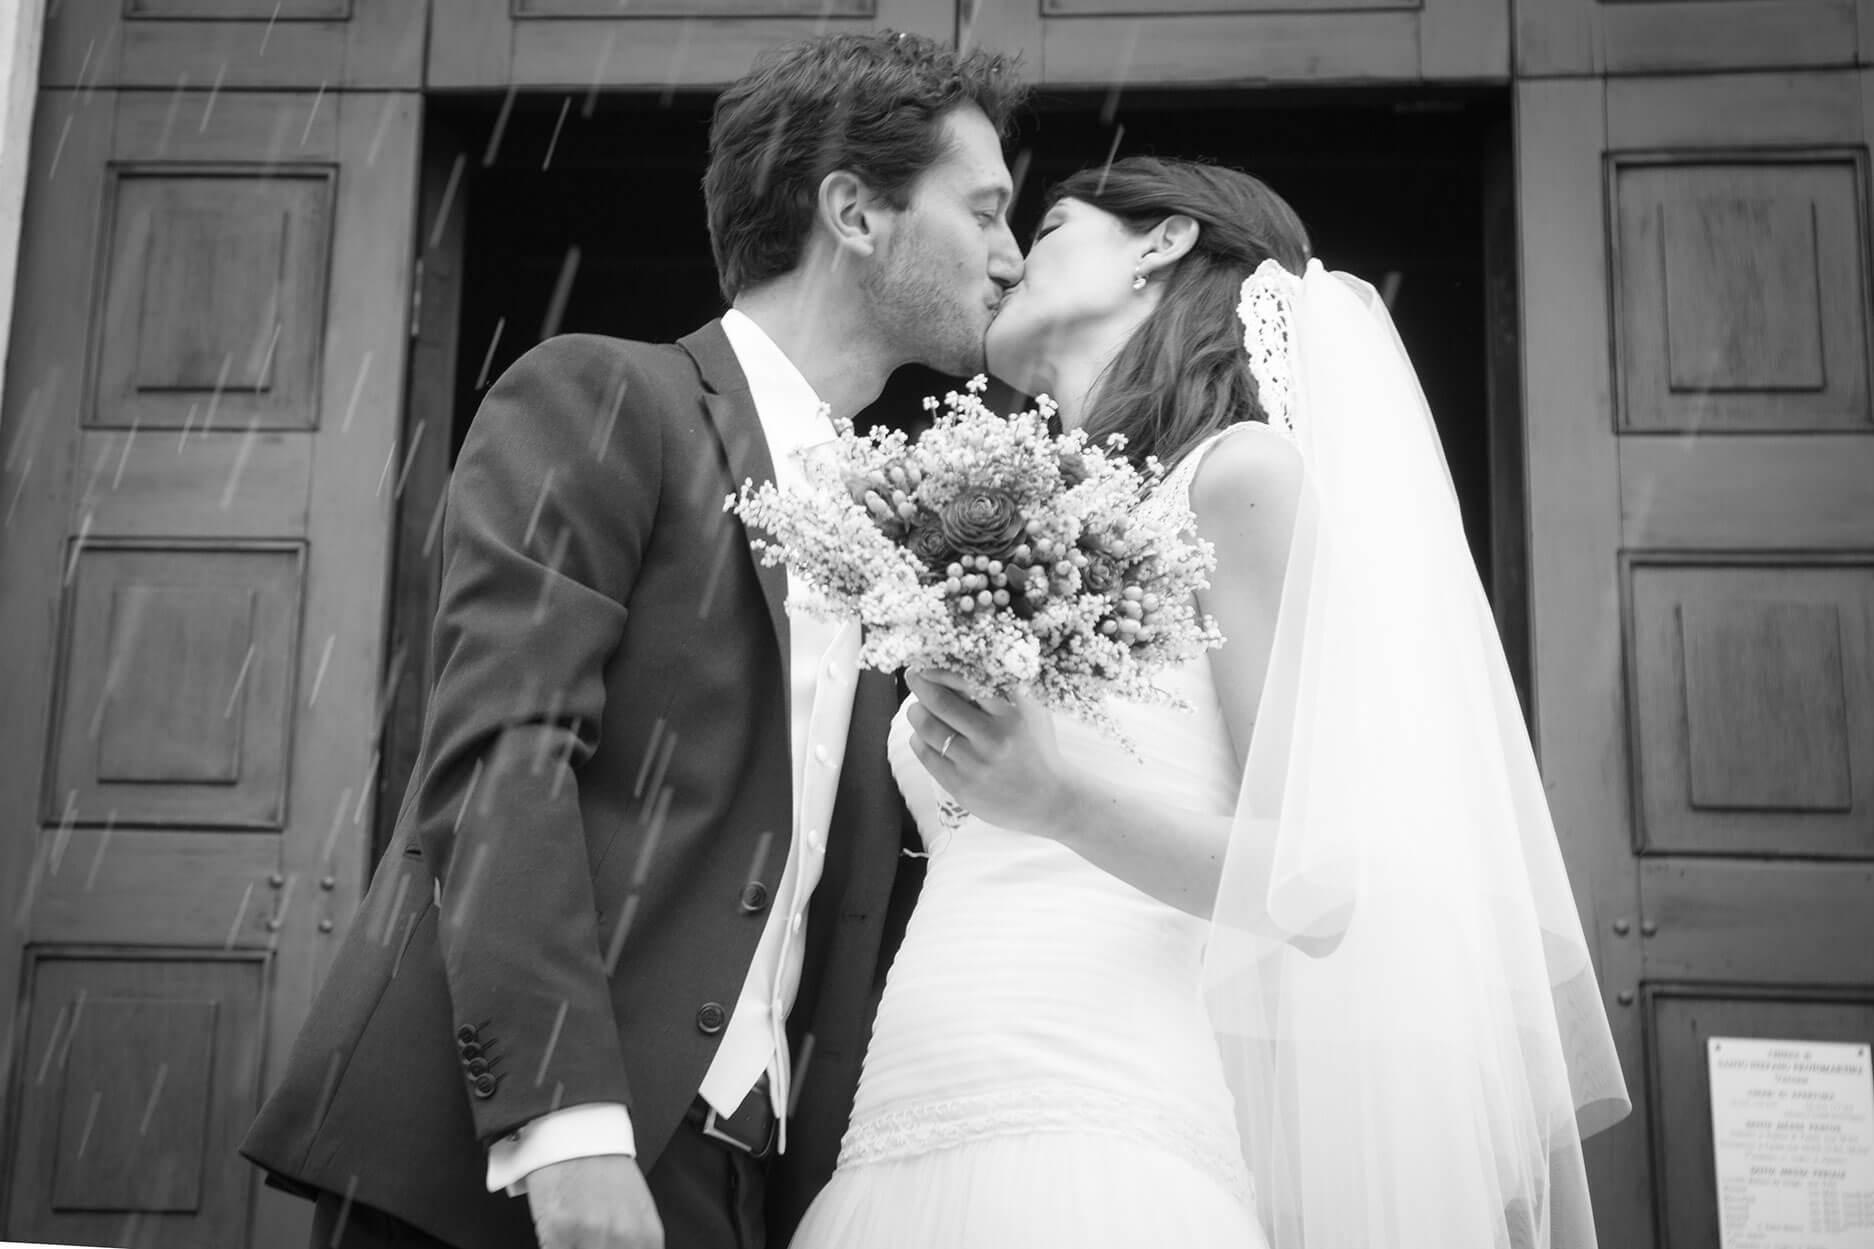 Francesca-Ferrati-wedding-photographer-Verona-Elena-Tommaso19